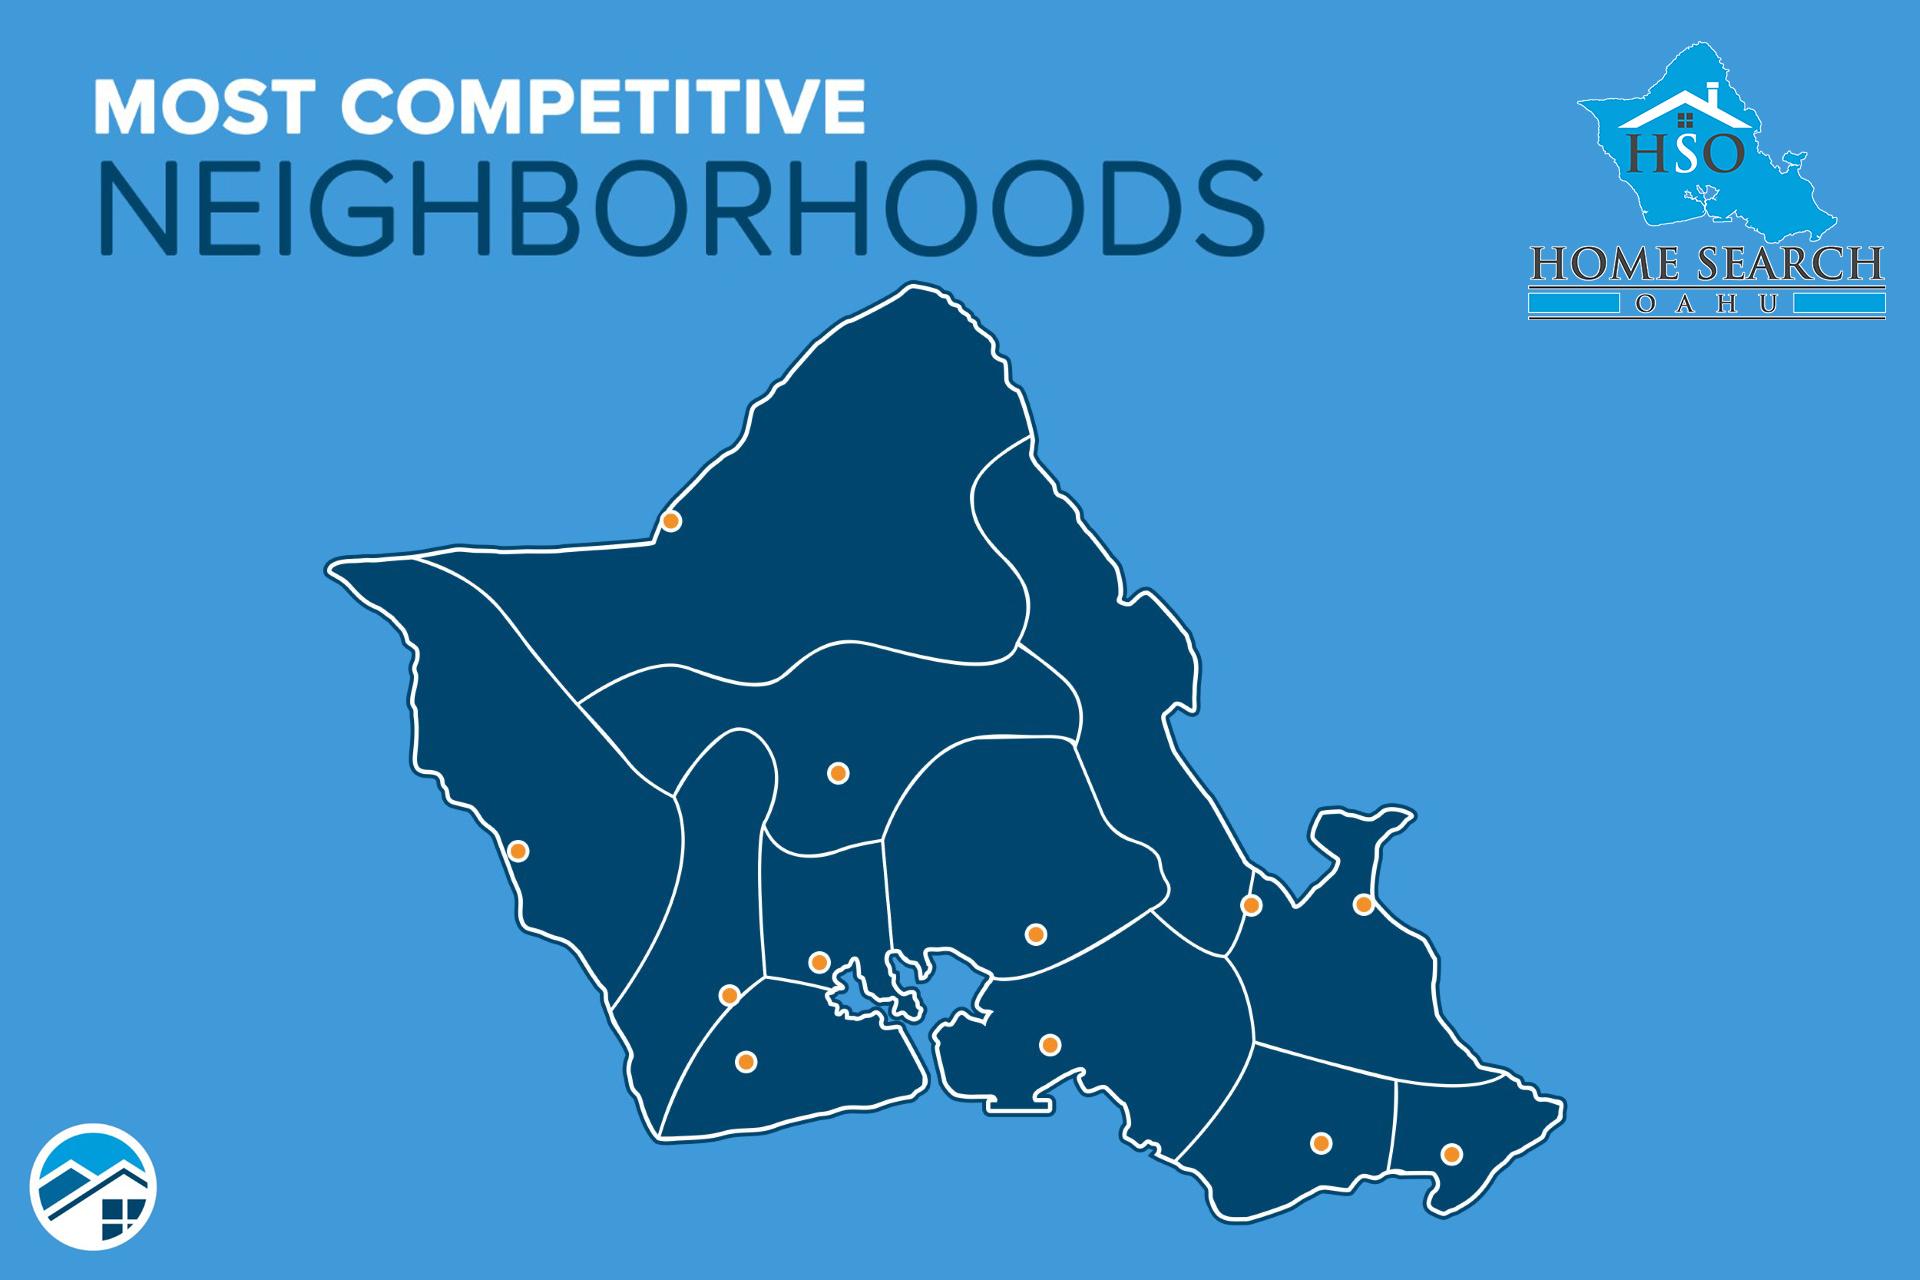 The Most Competitive Neighborhoods on Oahu